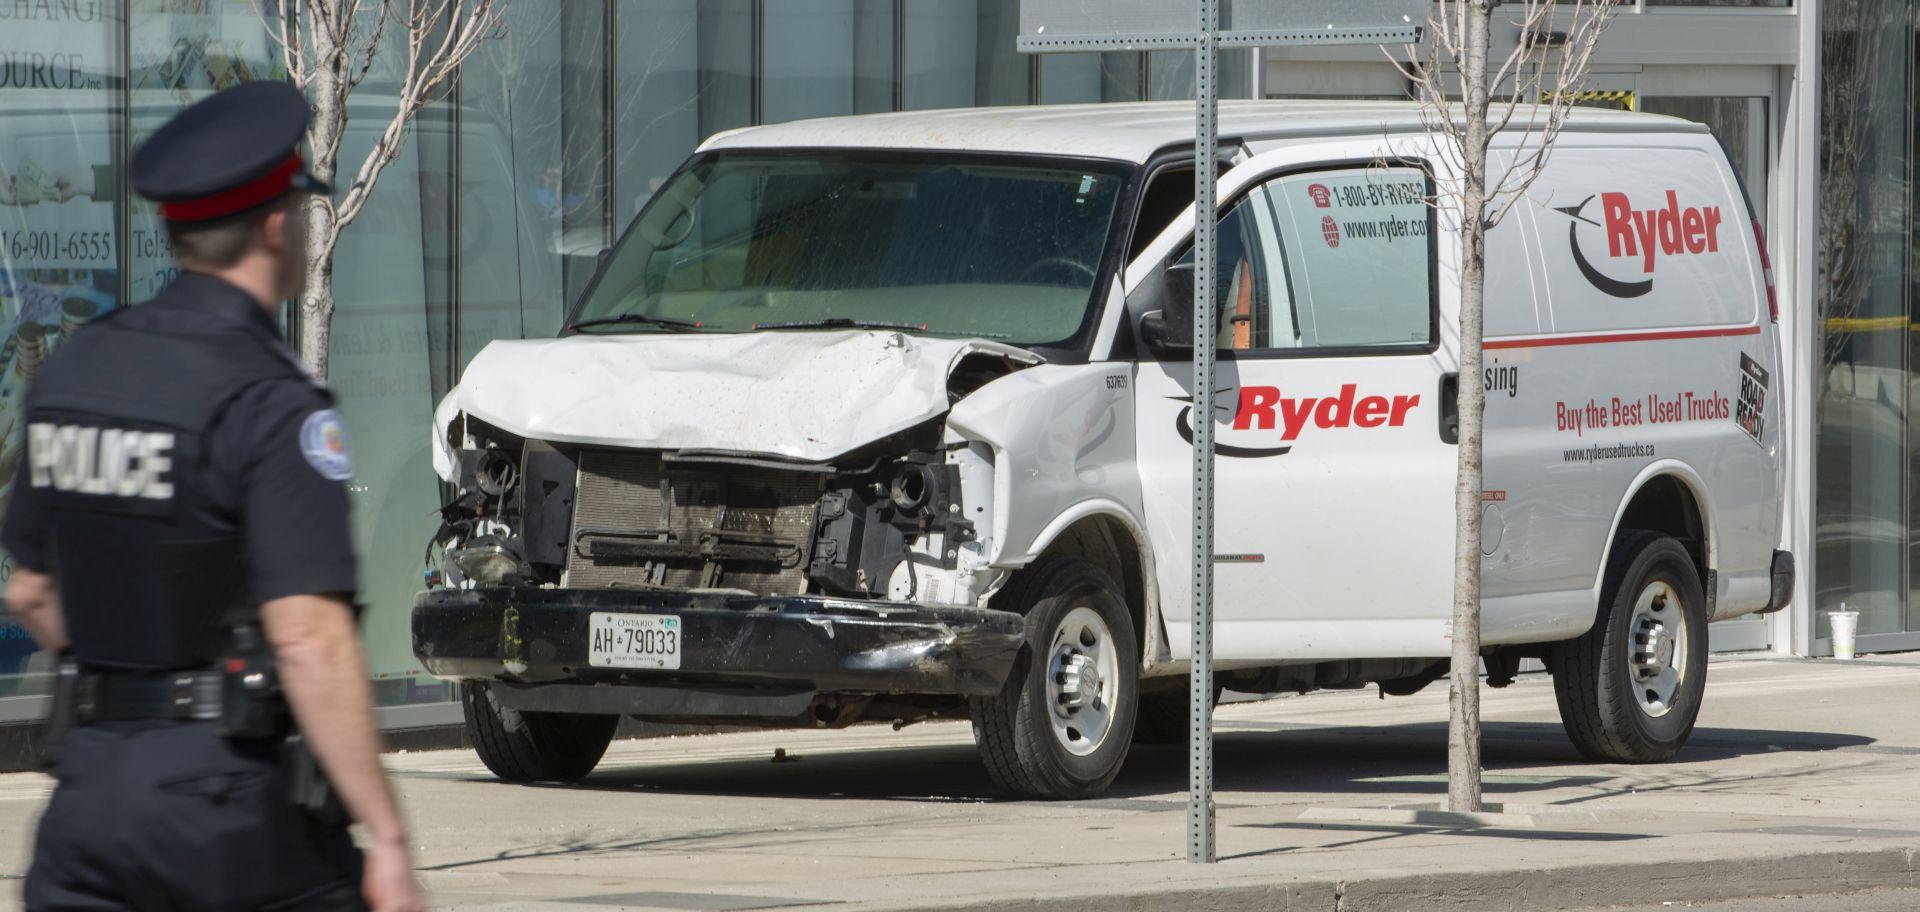 Identificiran napadač u Torontu, motiv napada još nepoznat